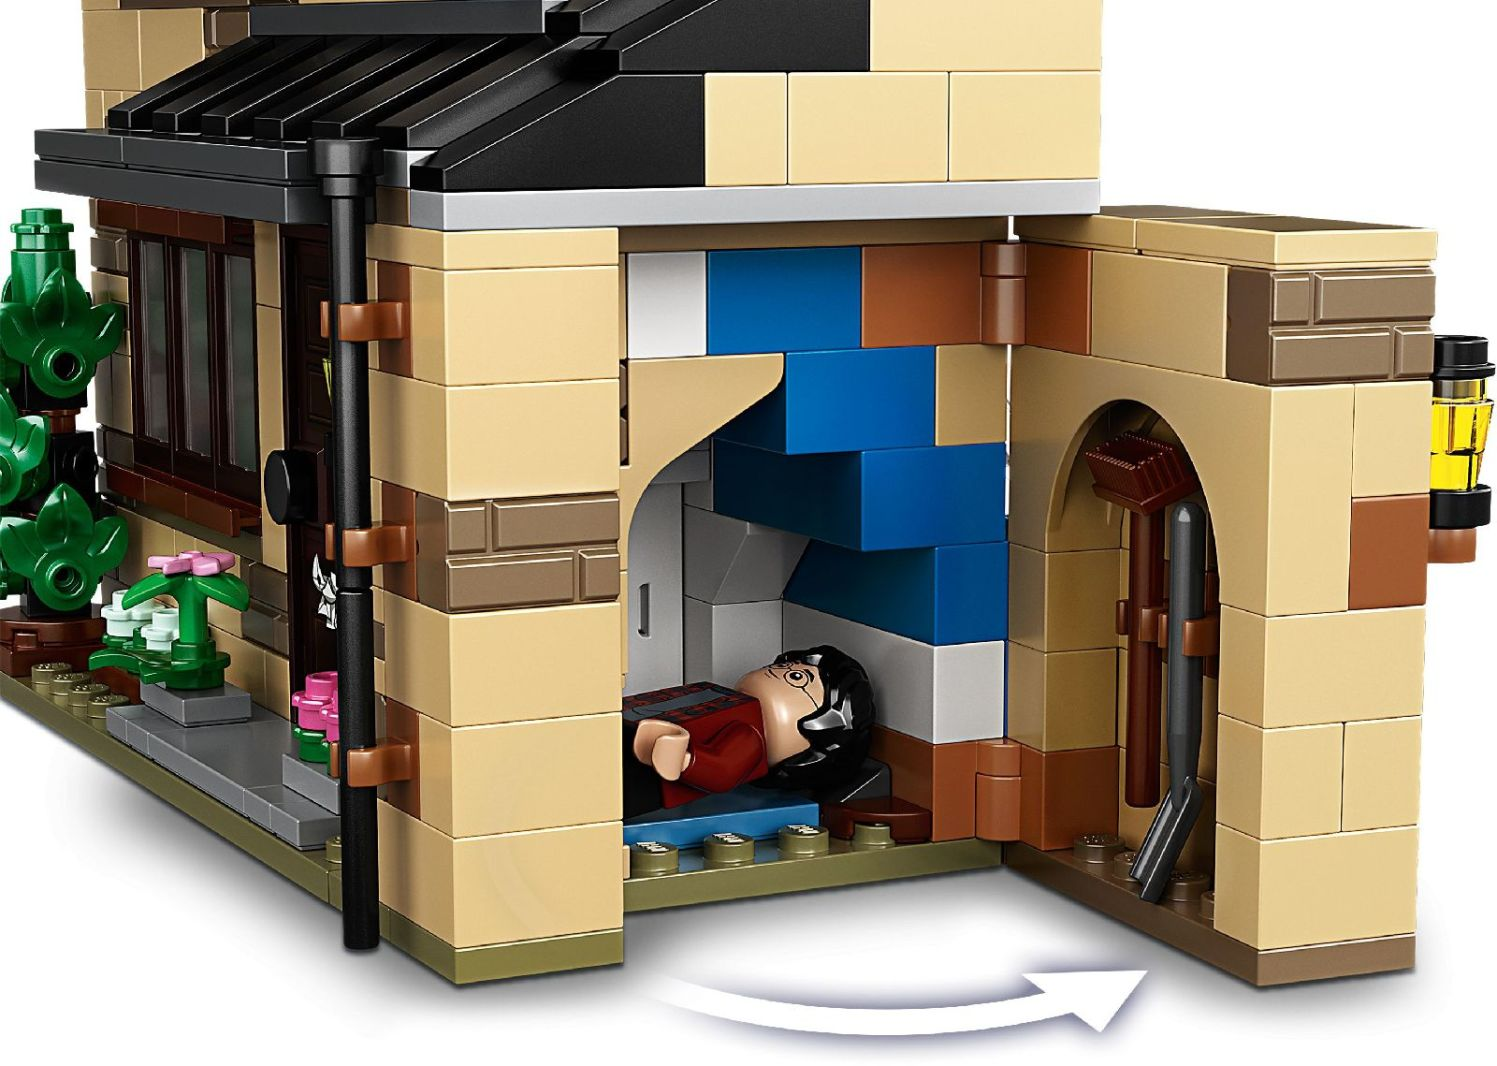 Lego Harry Potter Trade 75968 Ligusterweg 4 Trade Taschengeldd